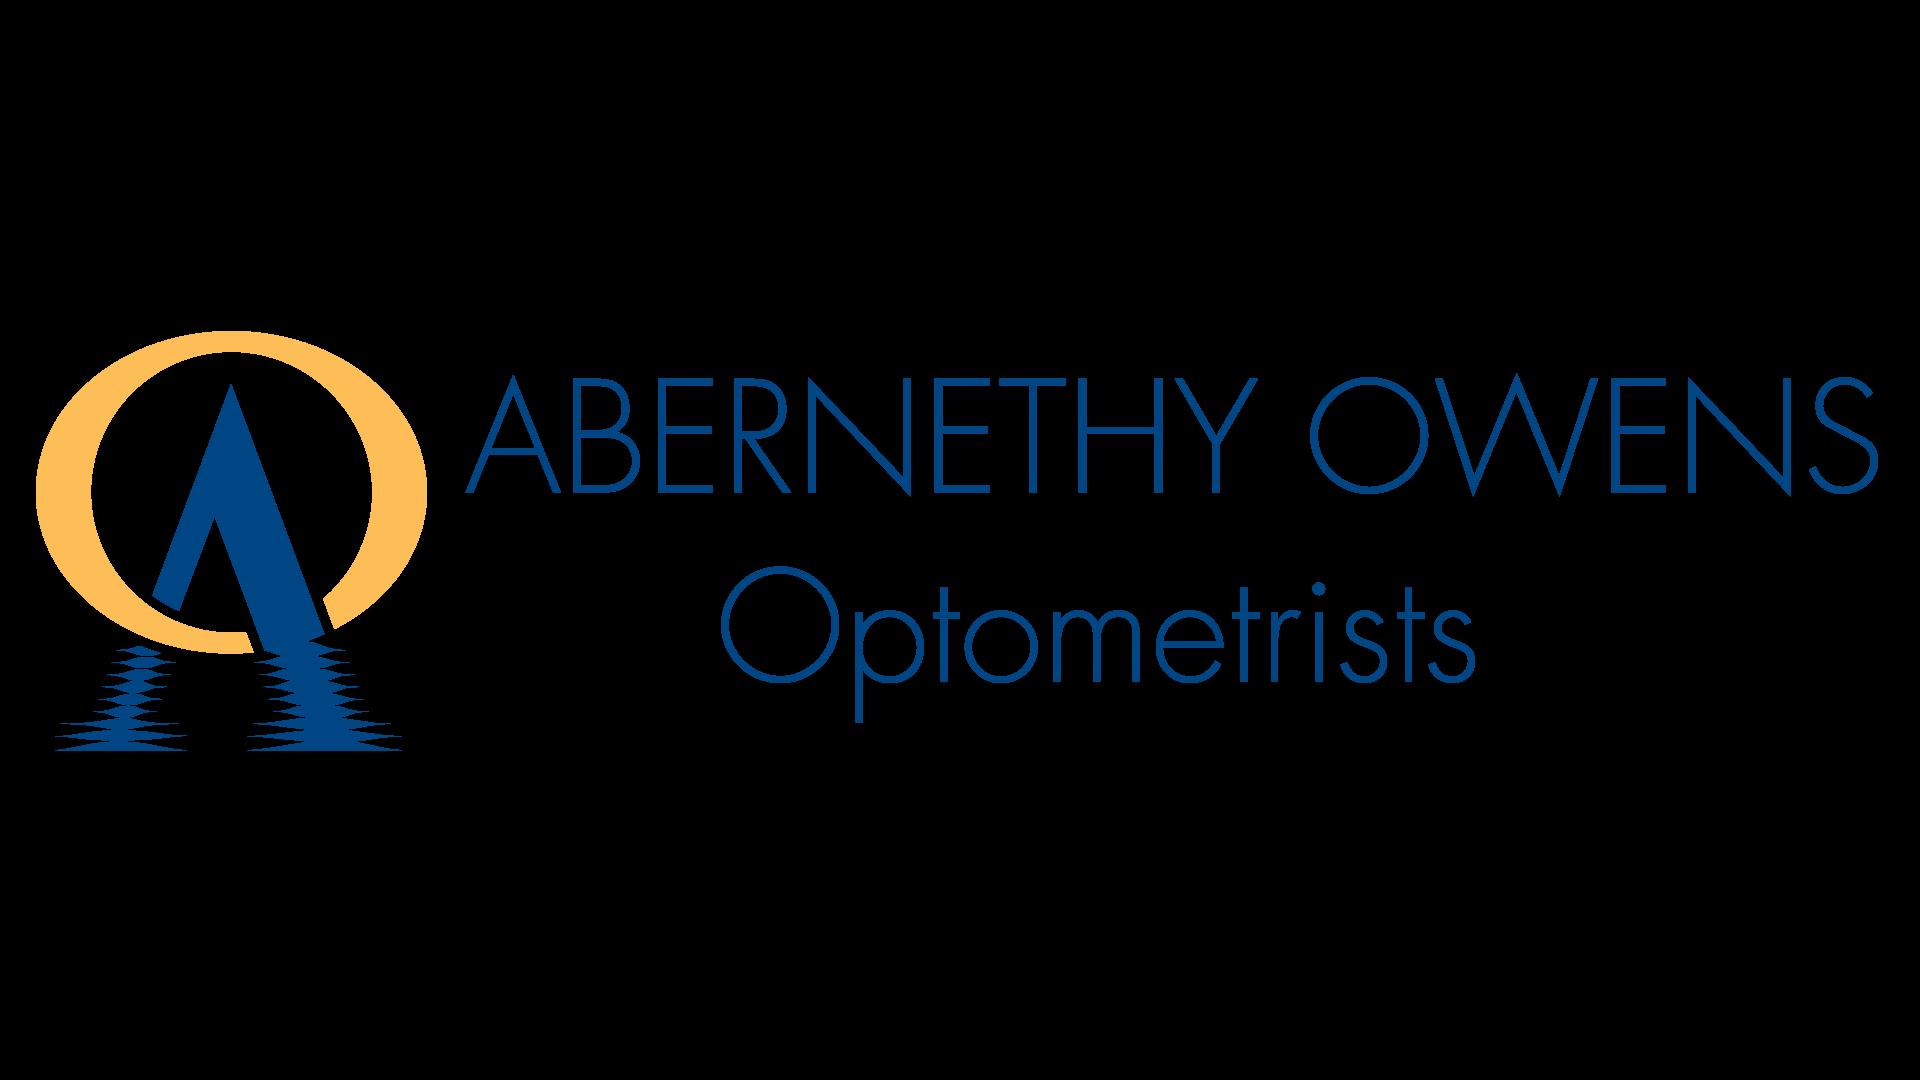 logo for Abernethy Owens Optometrists Woodvale Optometrists